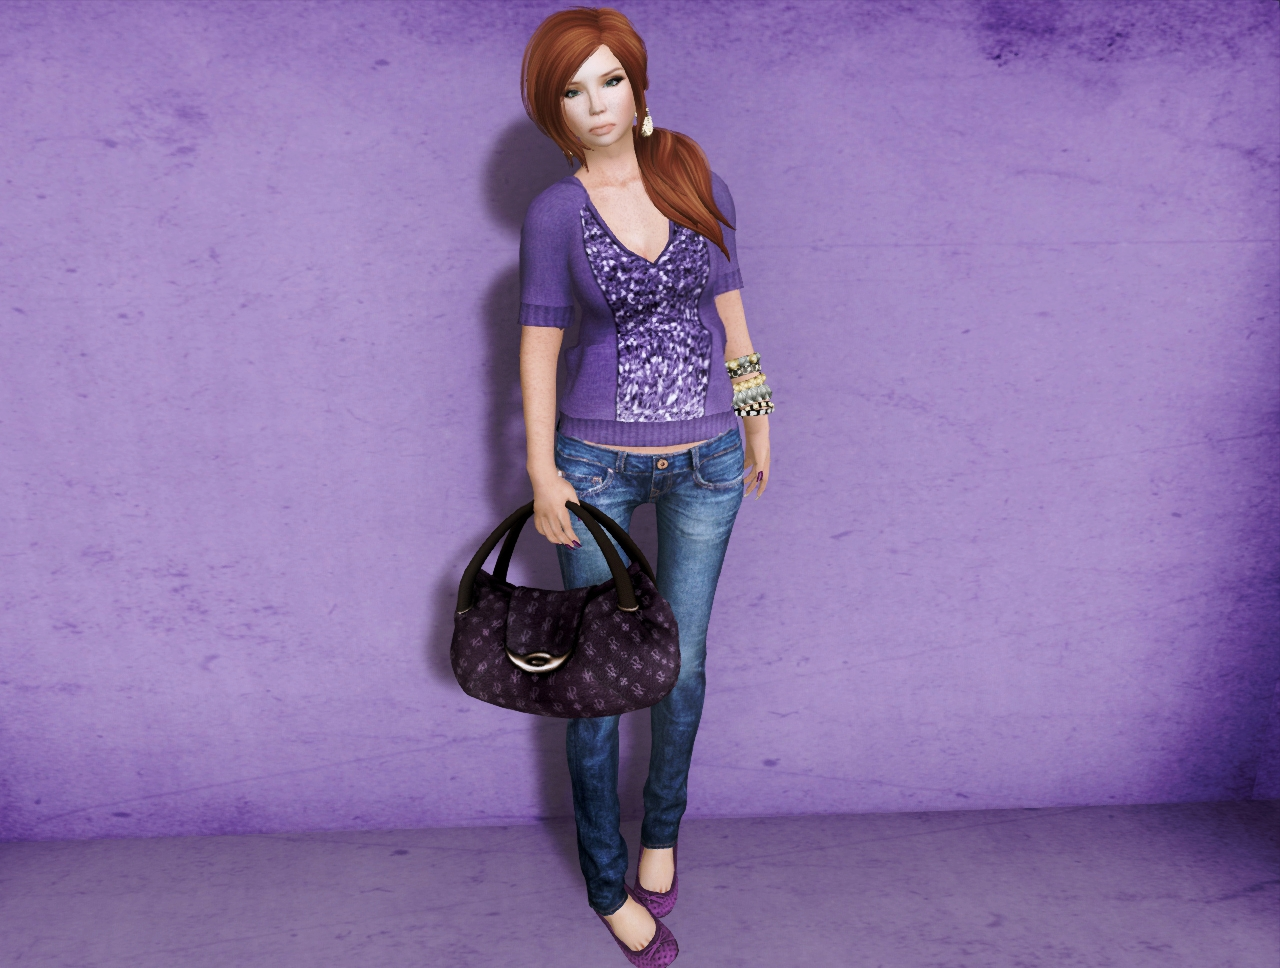 Laura B Candy Doll Imagenes: Candydoll Laura B Joy Studio Design Gallery Best Design